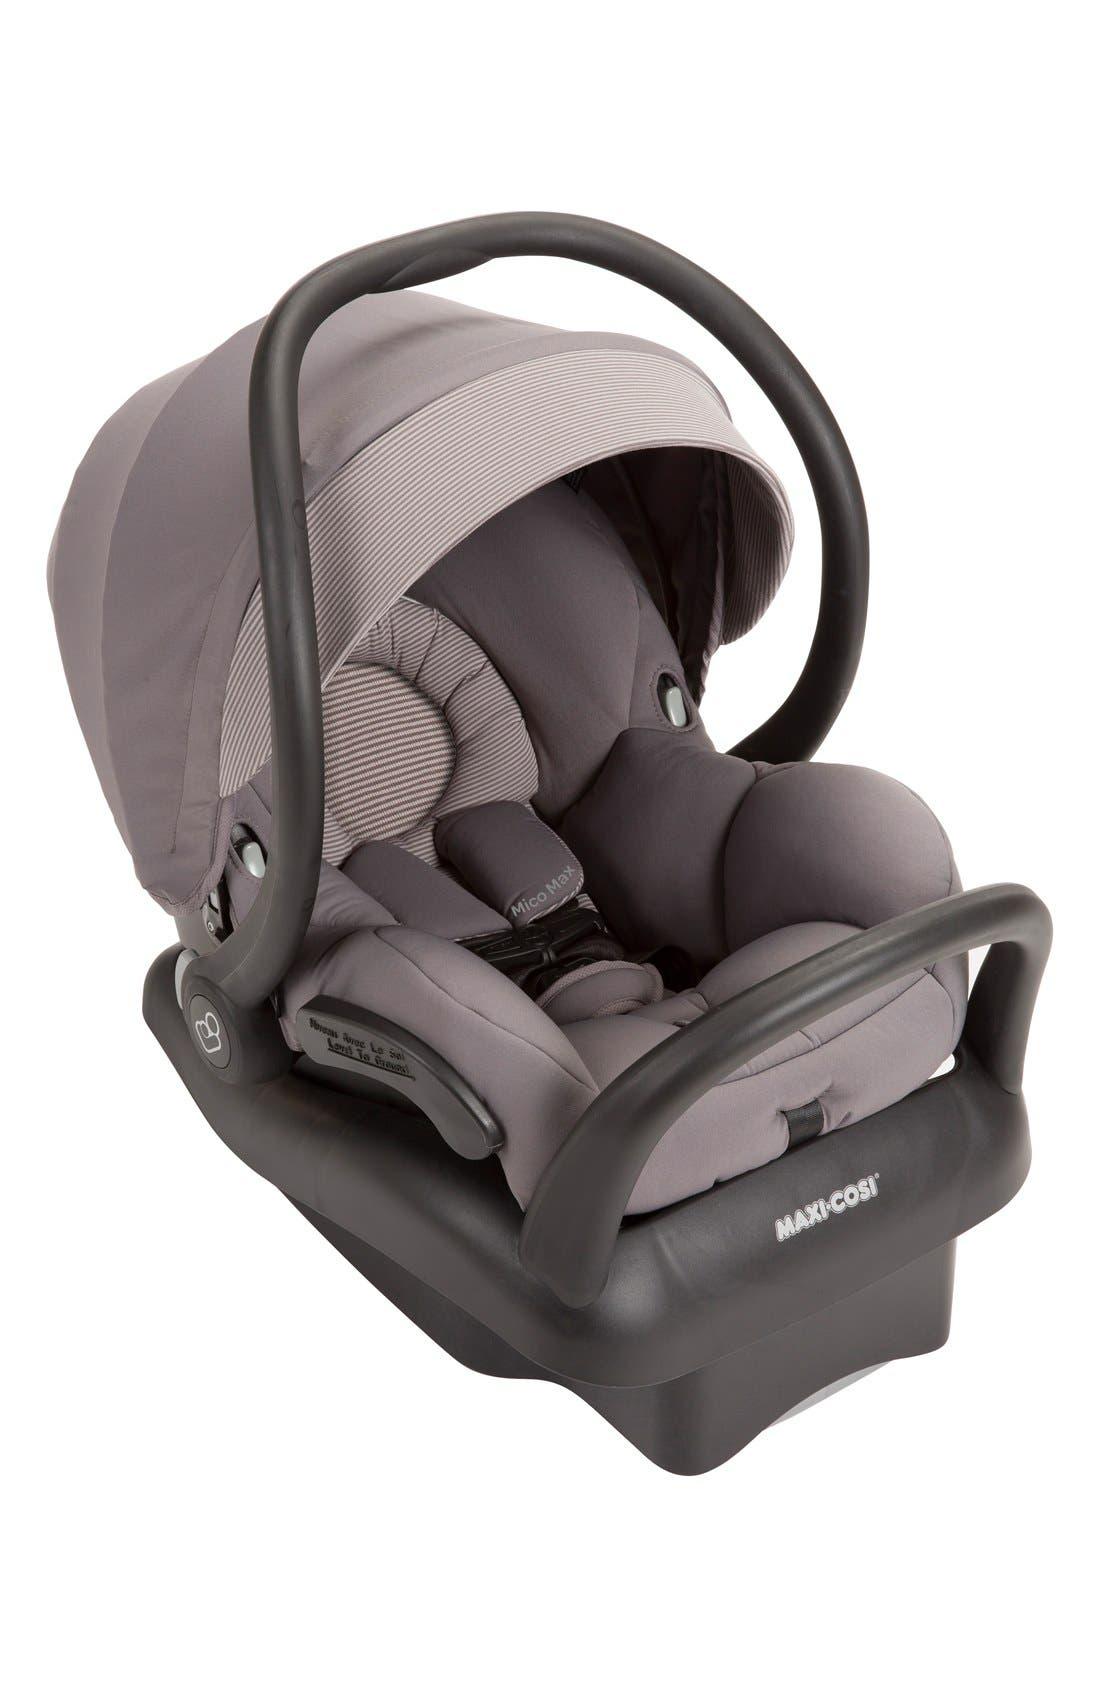 Mico Max 30 Infant Car Seat,                             Main thumbnail 1, color,                             Grey Gravel